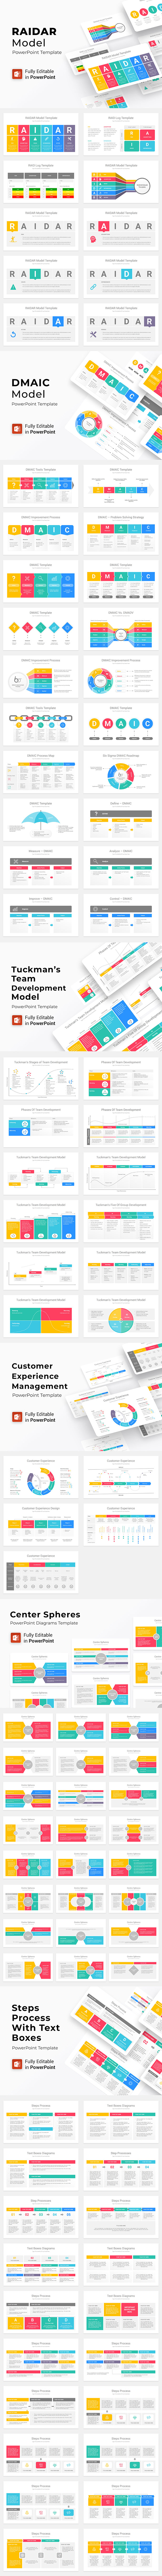 Slide Deck - Multipurpose PowerPoint Template - 8